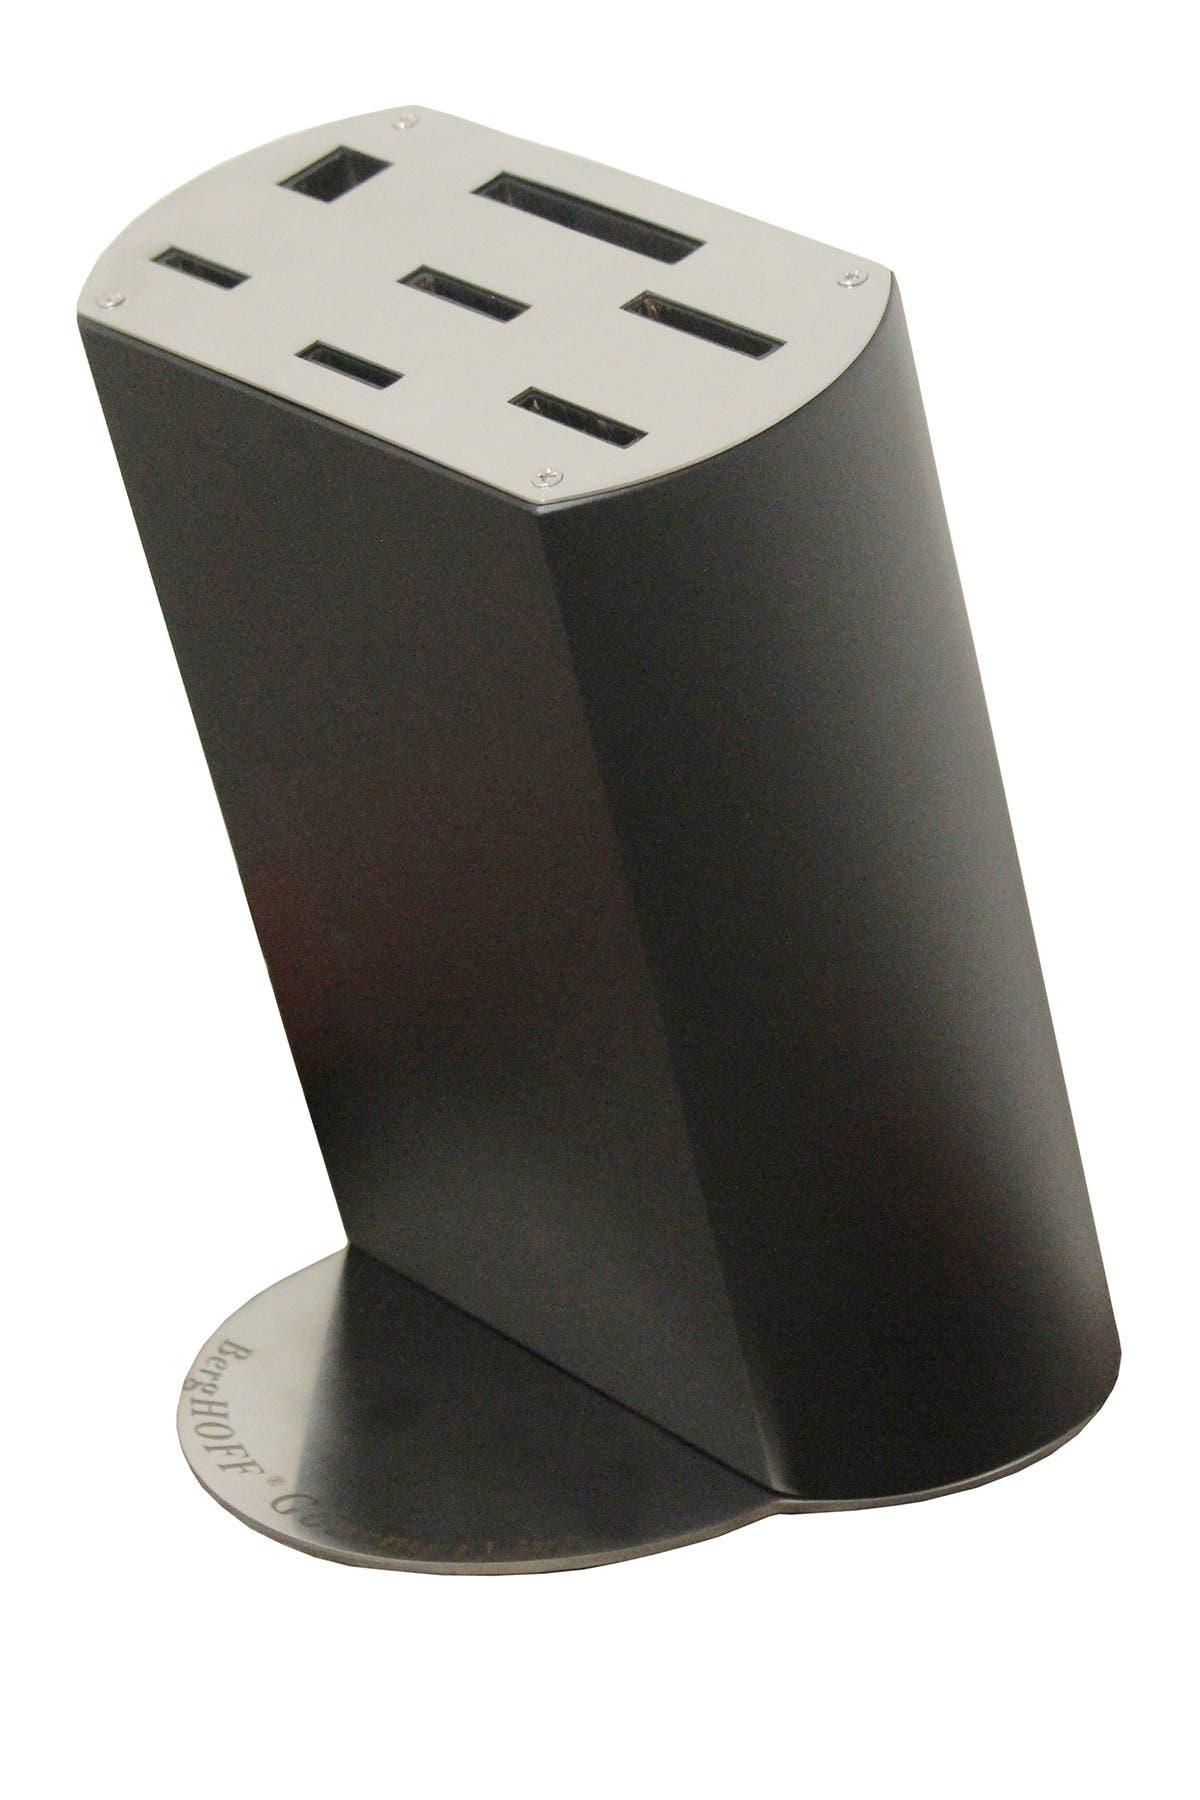 Image of BergHOFF Gourmet 8 Slot Cutlery Block